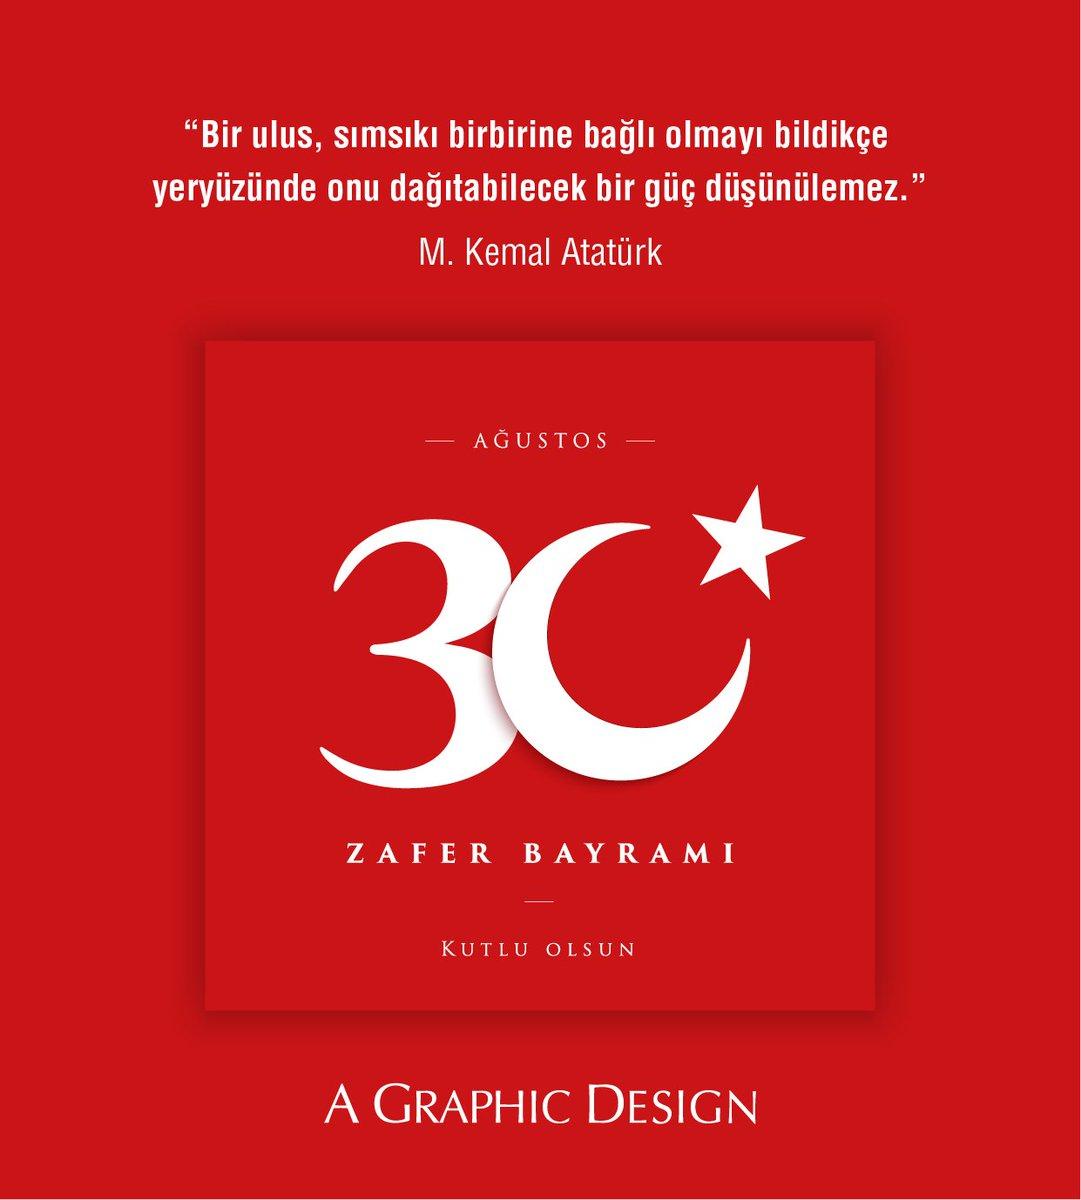 30 Ağustos Zafer Bayramı kutlu olsun! 🇹🇷  #30Ağustos #ZaferBayramı #agrafikdizayn https://t.co/itSeZVf1IP